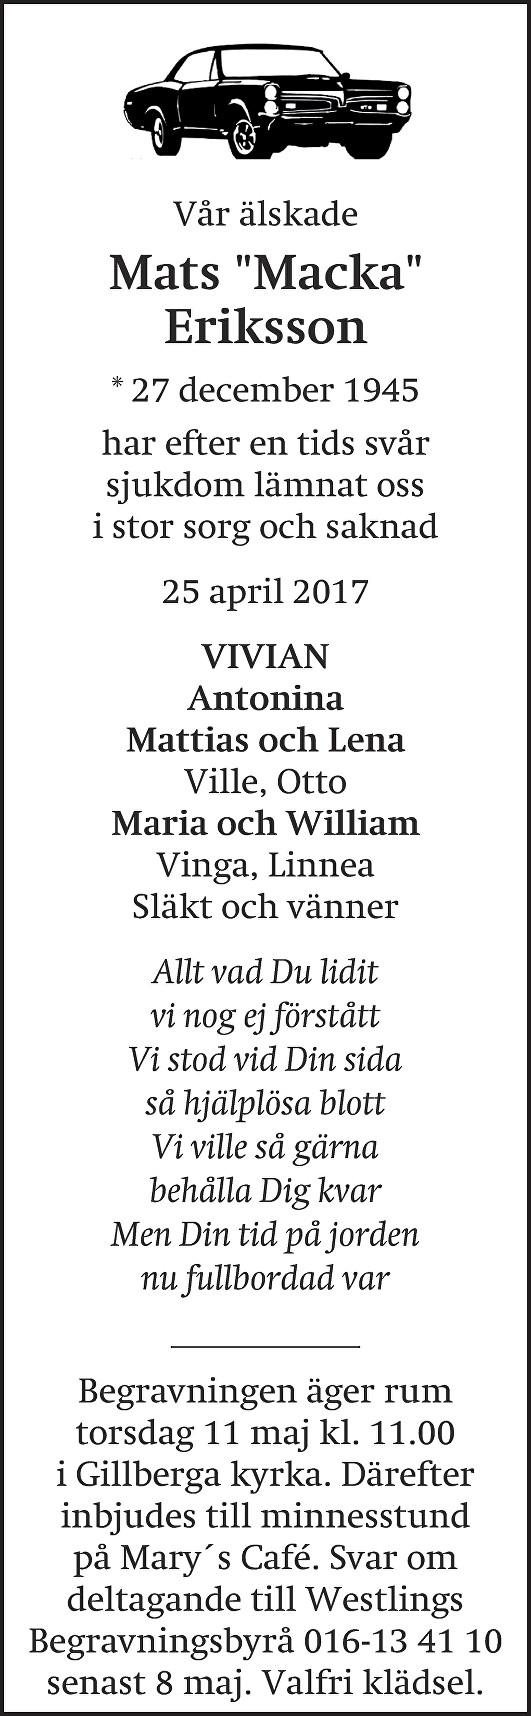 Söderhamns kuriren dödsannonser hd 2017